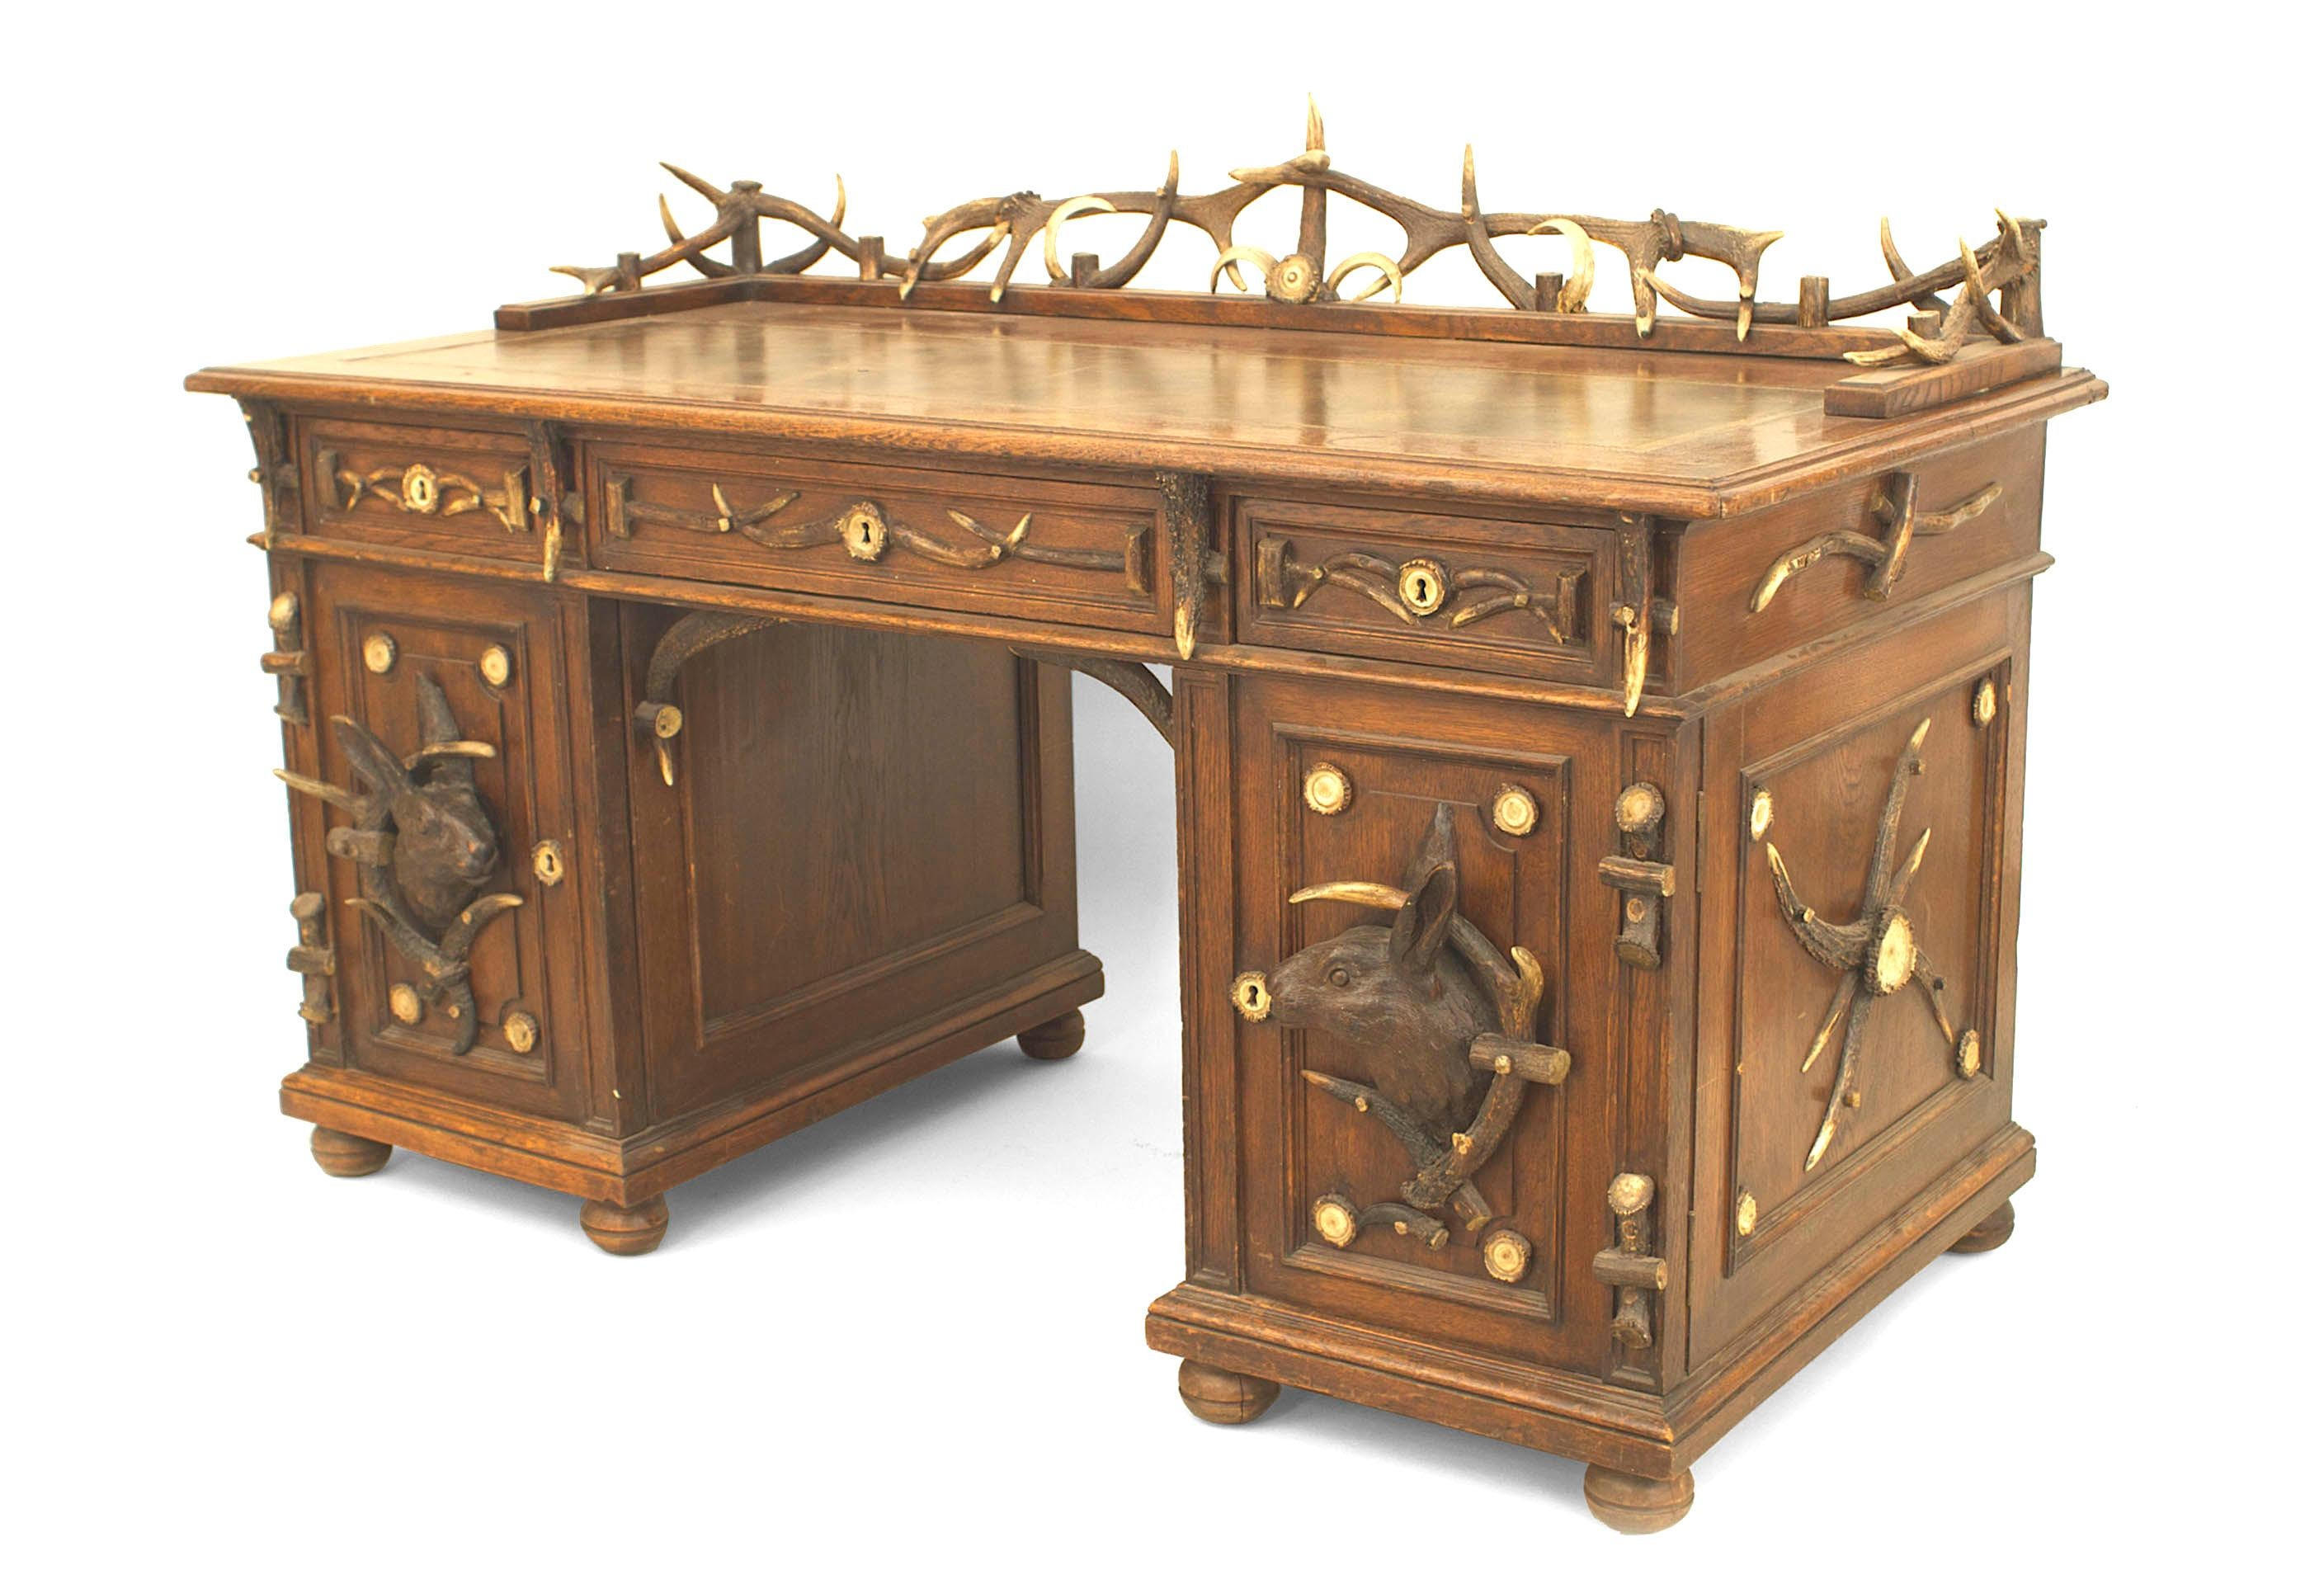 44th c. Rustic German Horn and Carved Oak Desk